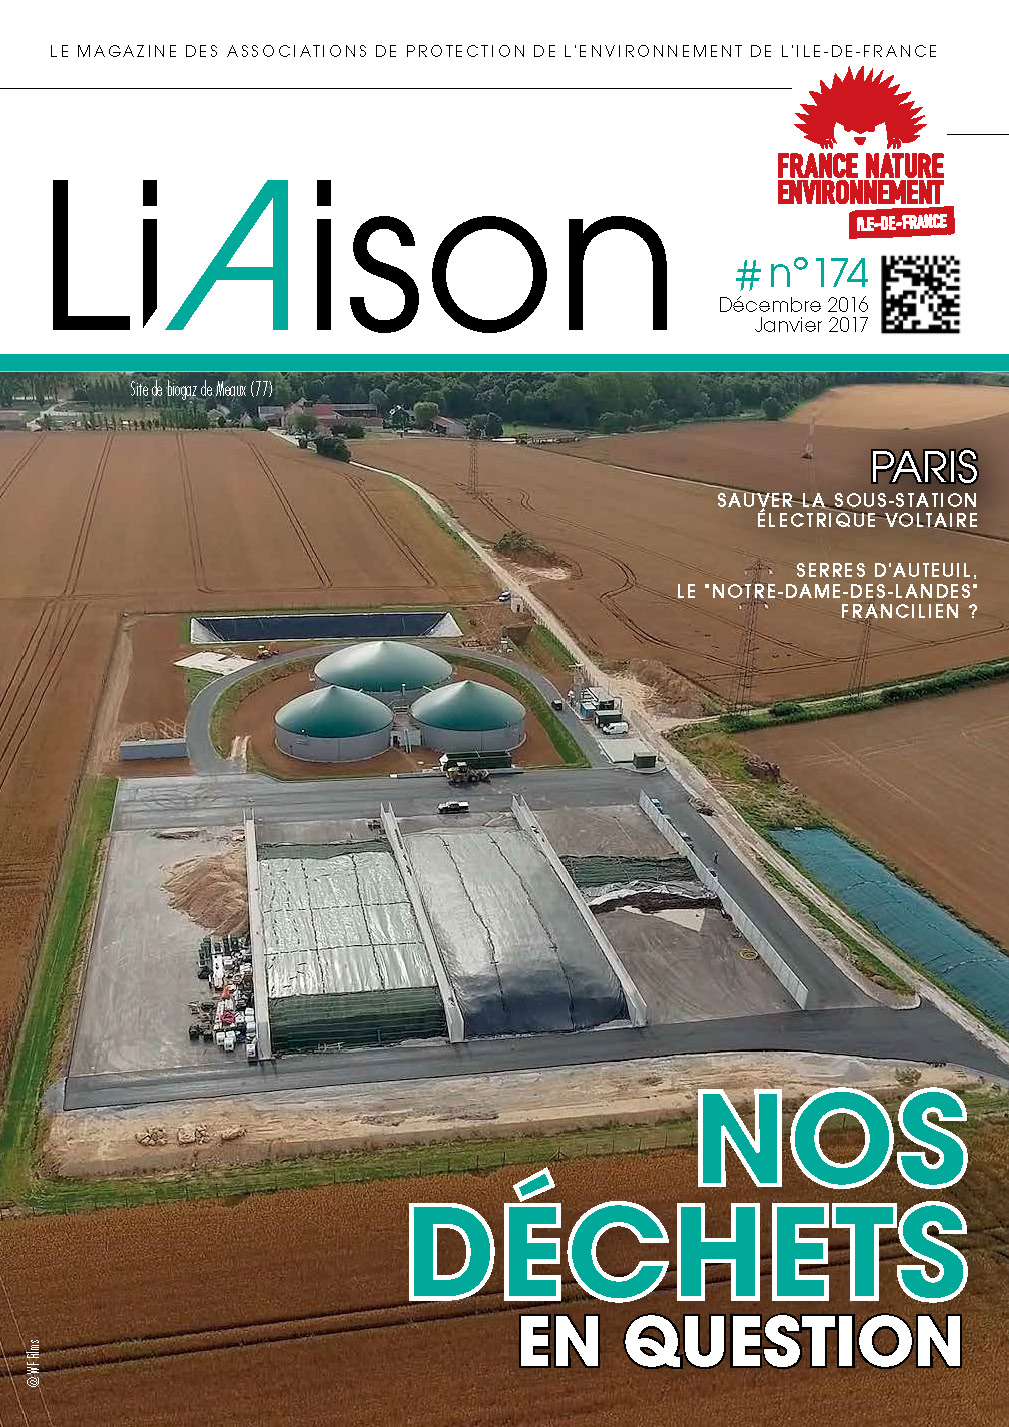 LIAISON 174 Page 01